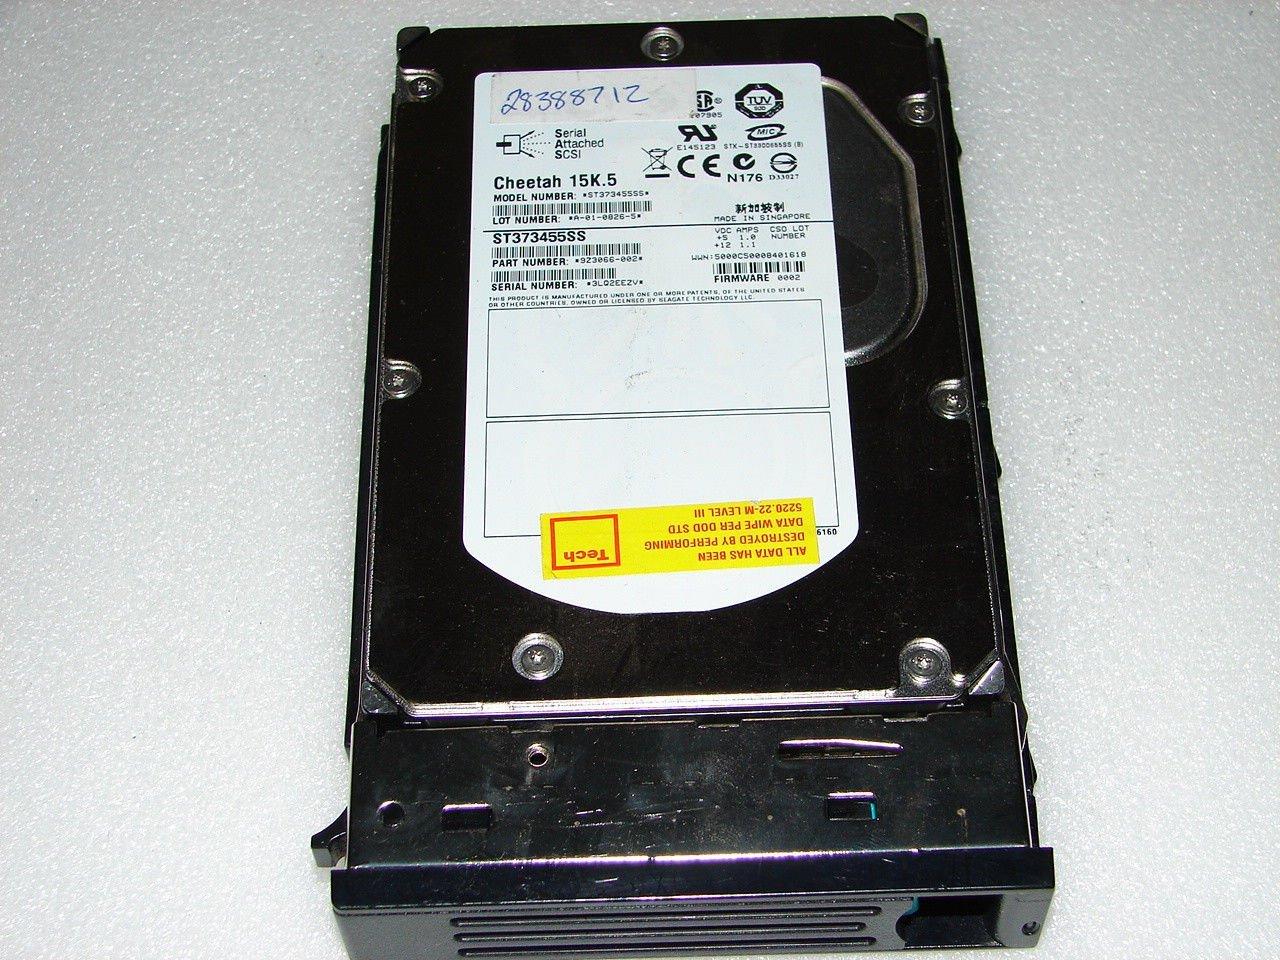 Dell C5711 73GB U320 15K SCSI PowerEdge Hard Drive in Tray